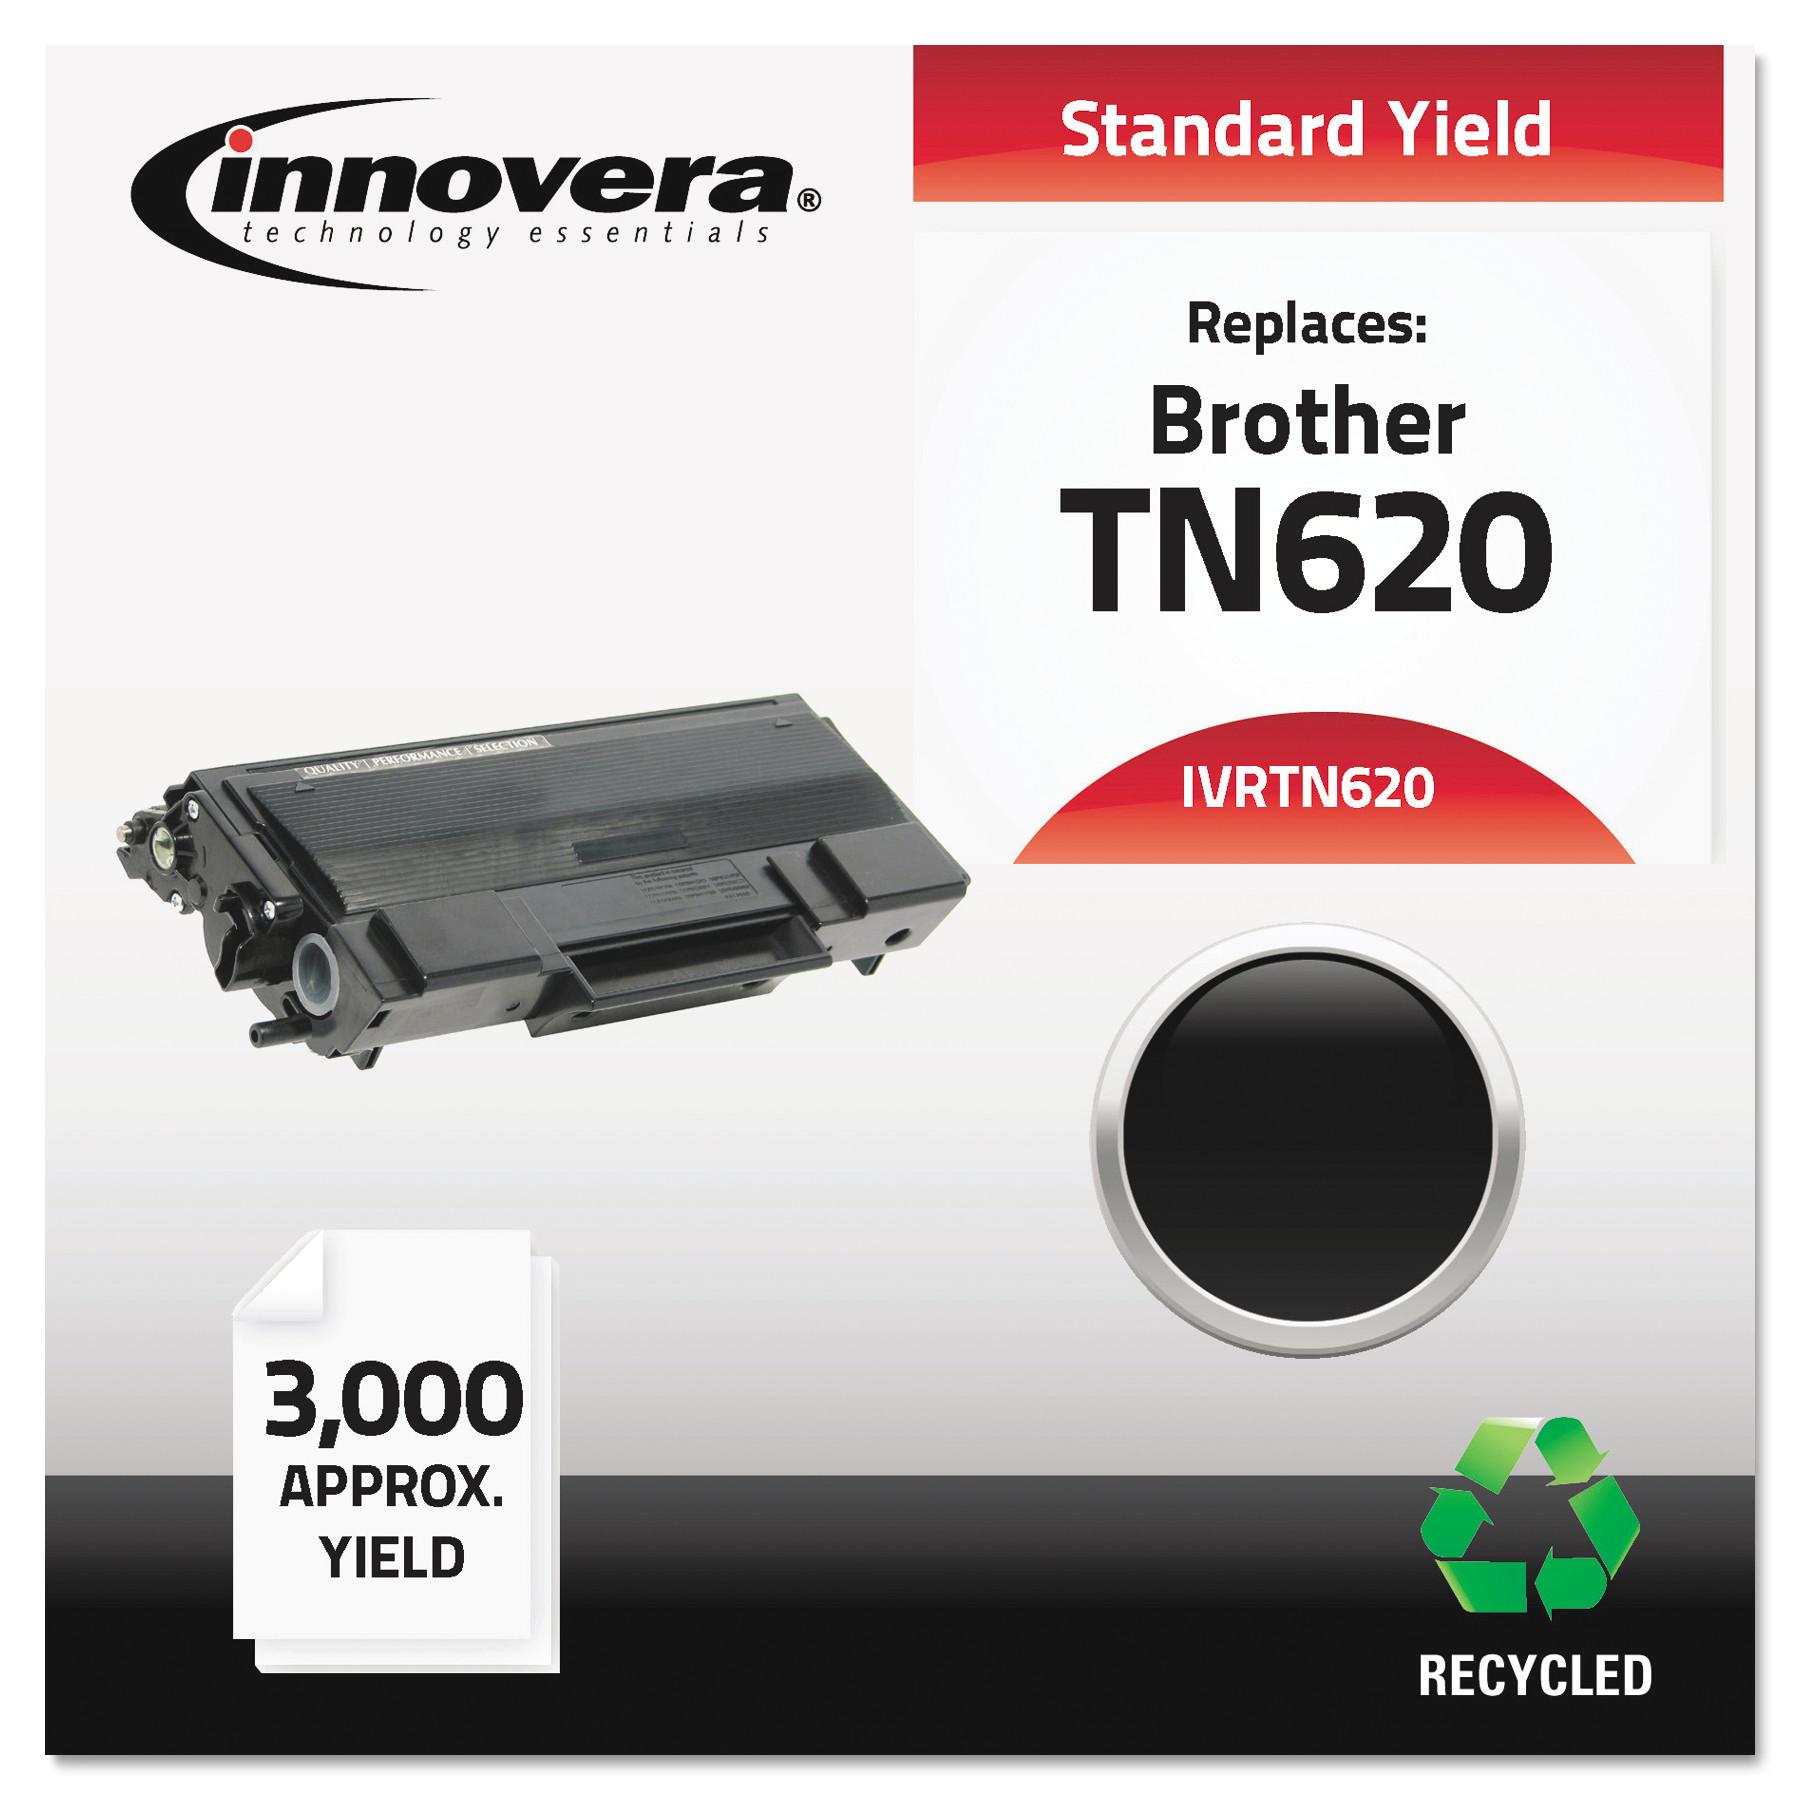 Innovera Remanufactured TN620 Toner, Black